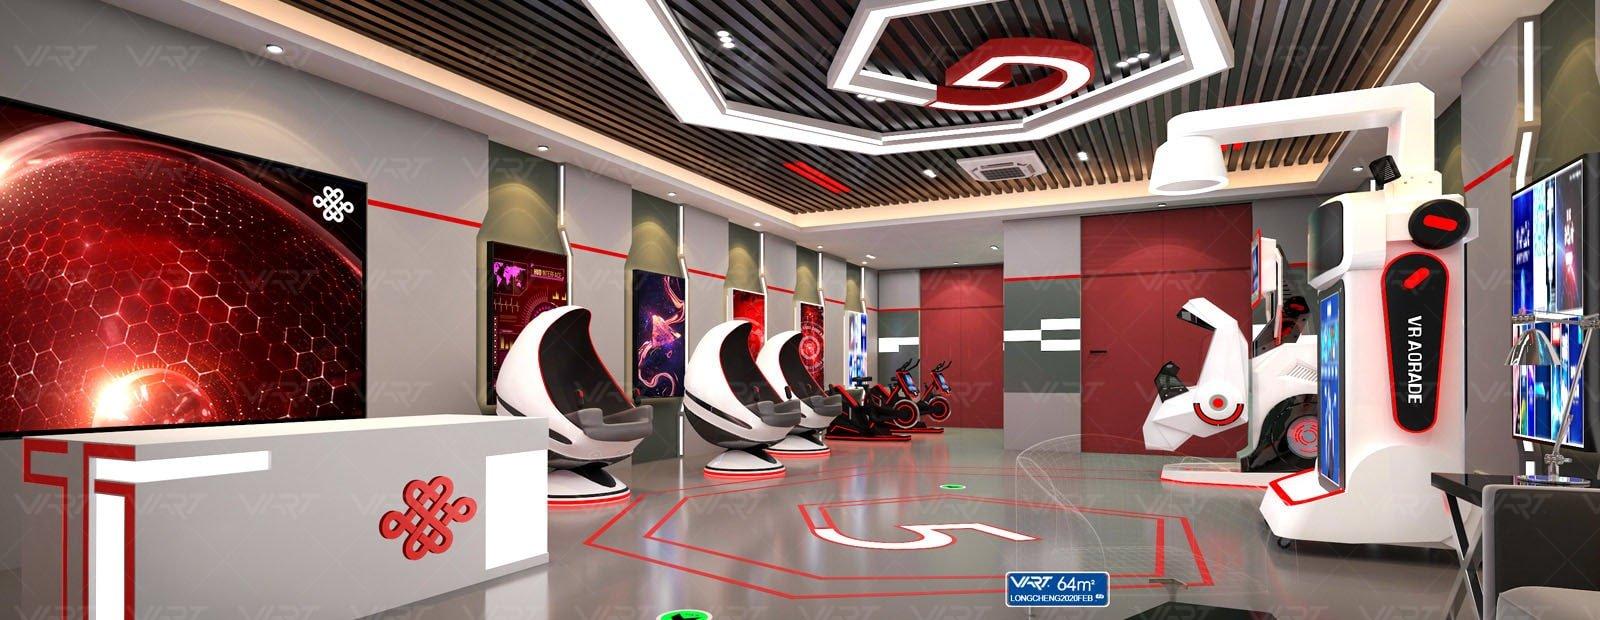 VR Theme Park China